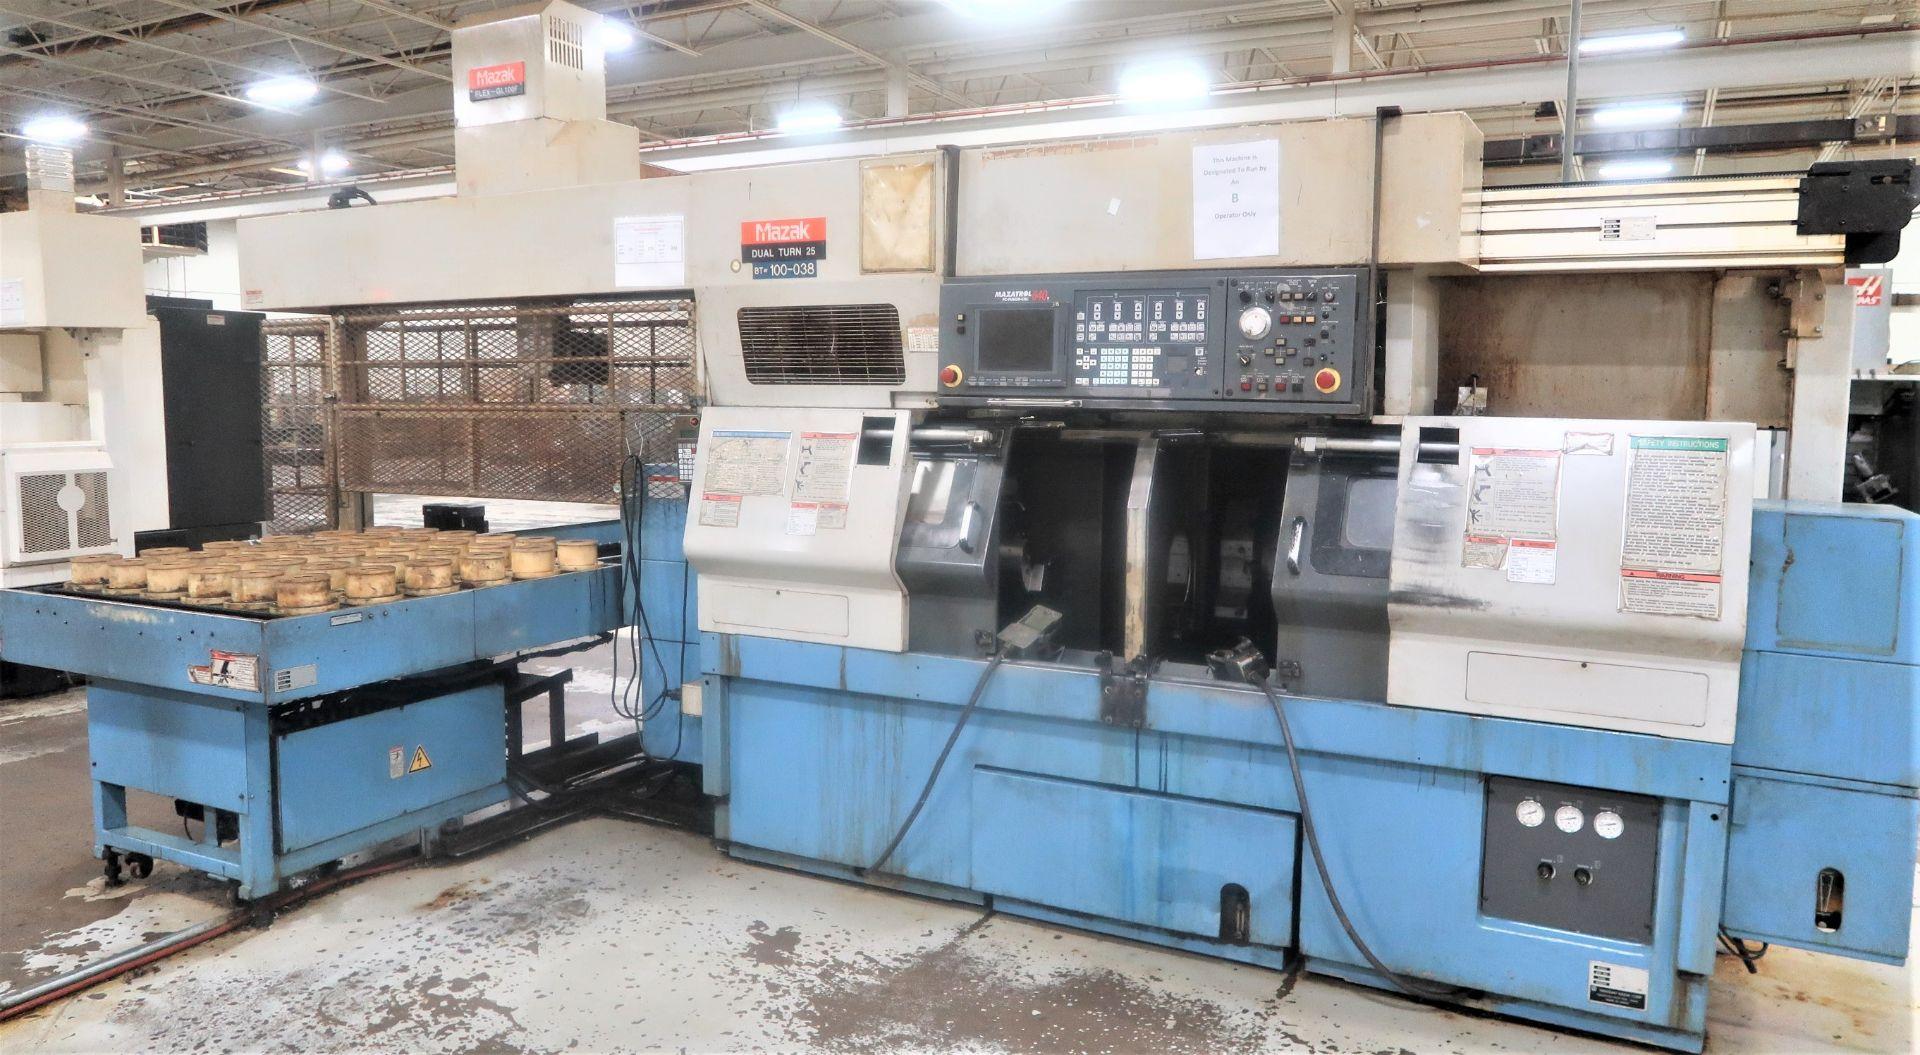 Mazak Dual Turn 25 Twin Spindle CNC Turning Center lathe, S/N 150888 - Image 2 of 13